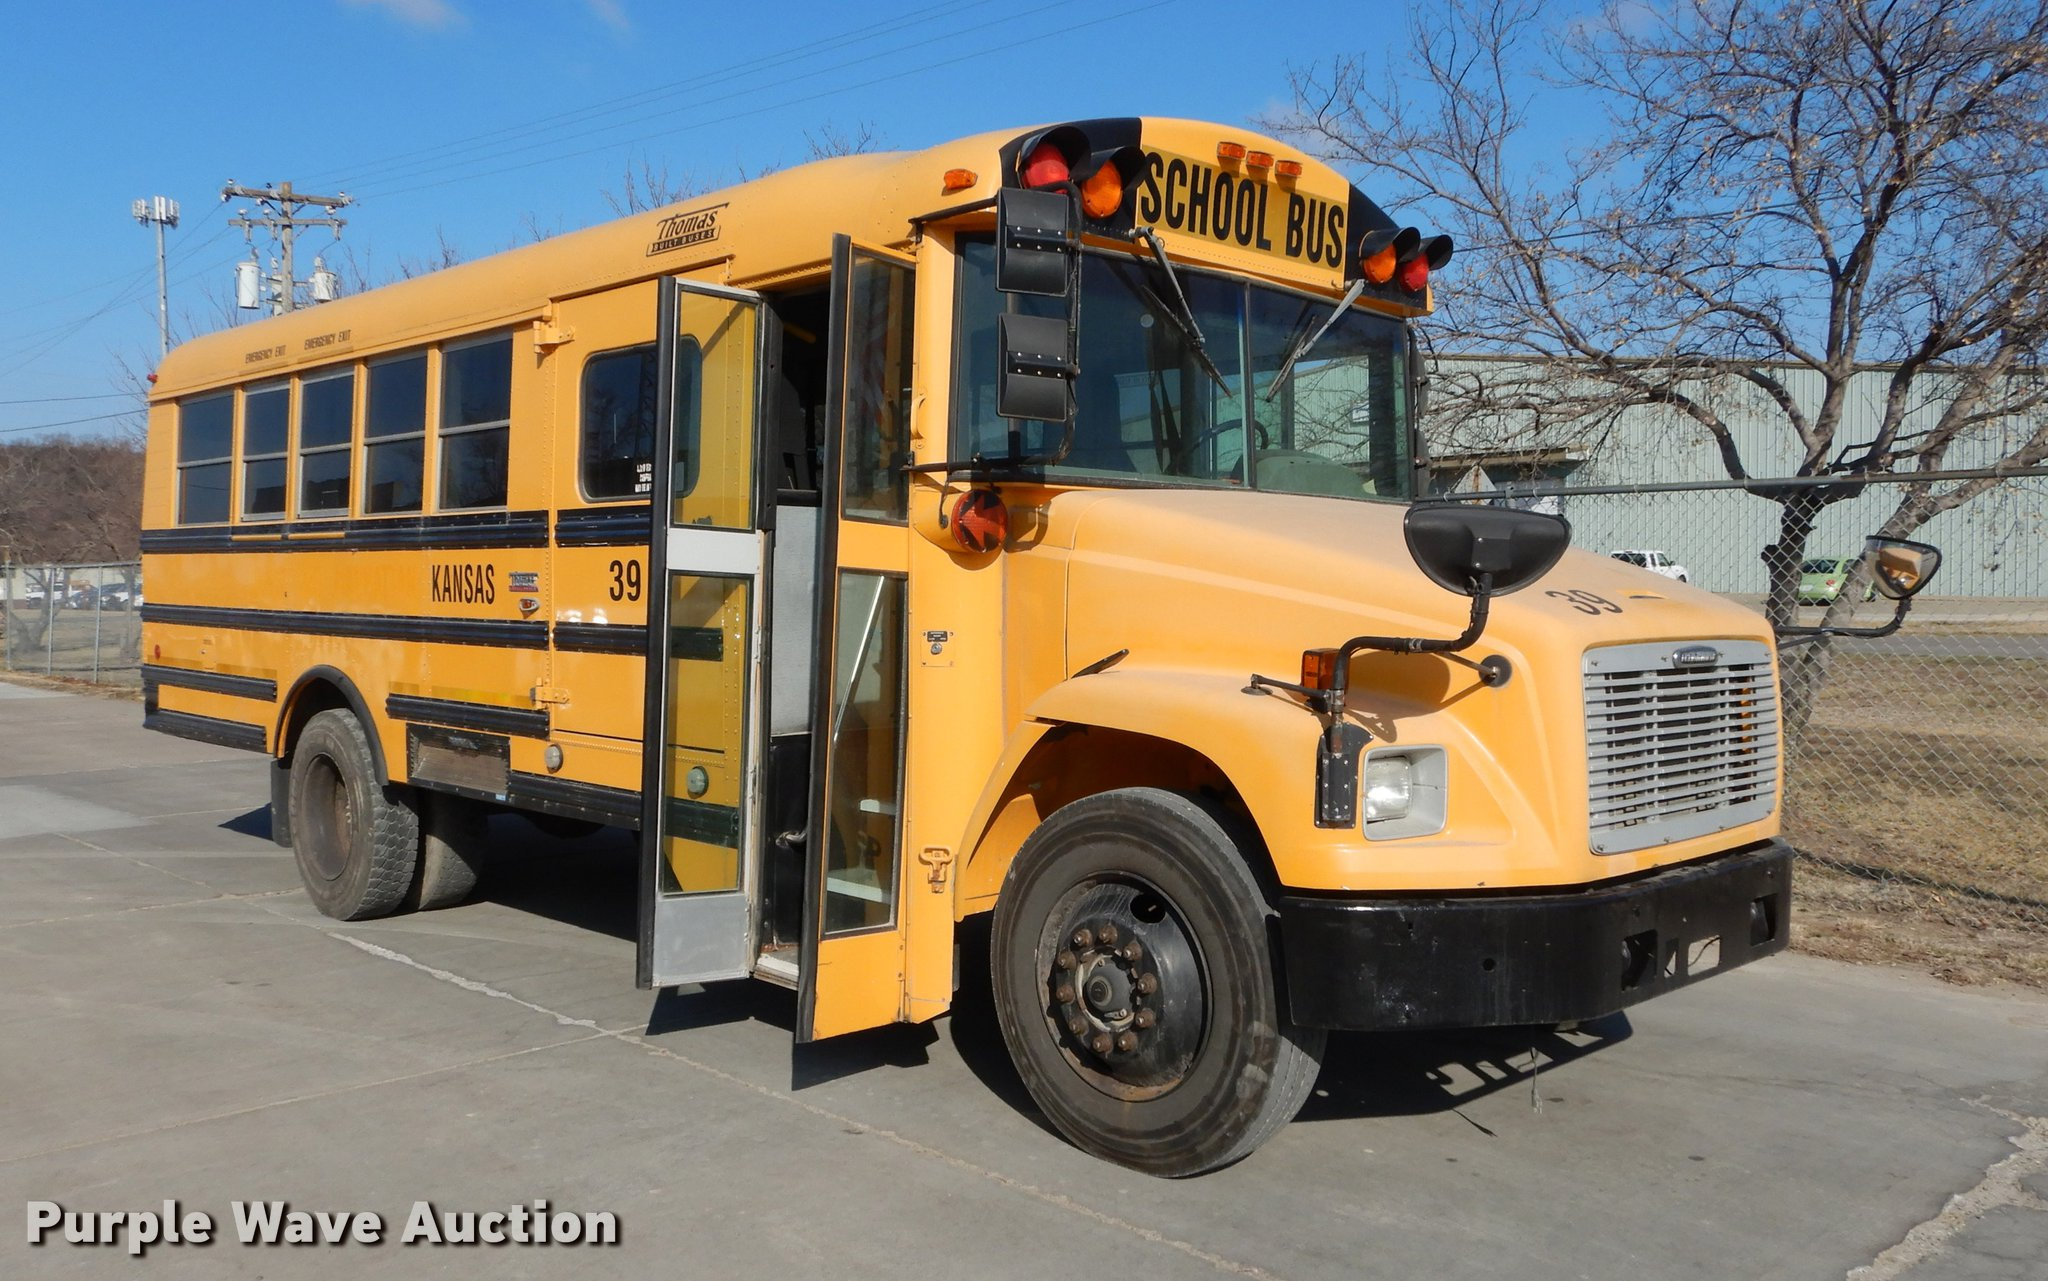 2004 Freightliner FS65 Thomas school bus | Item DC0351 | SOL